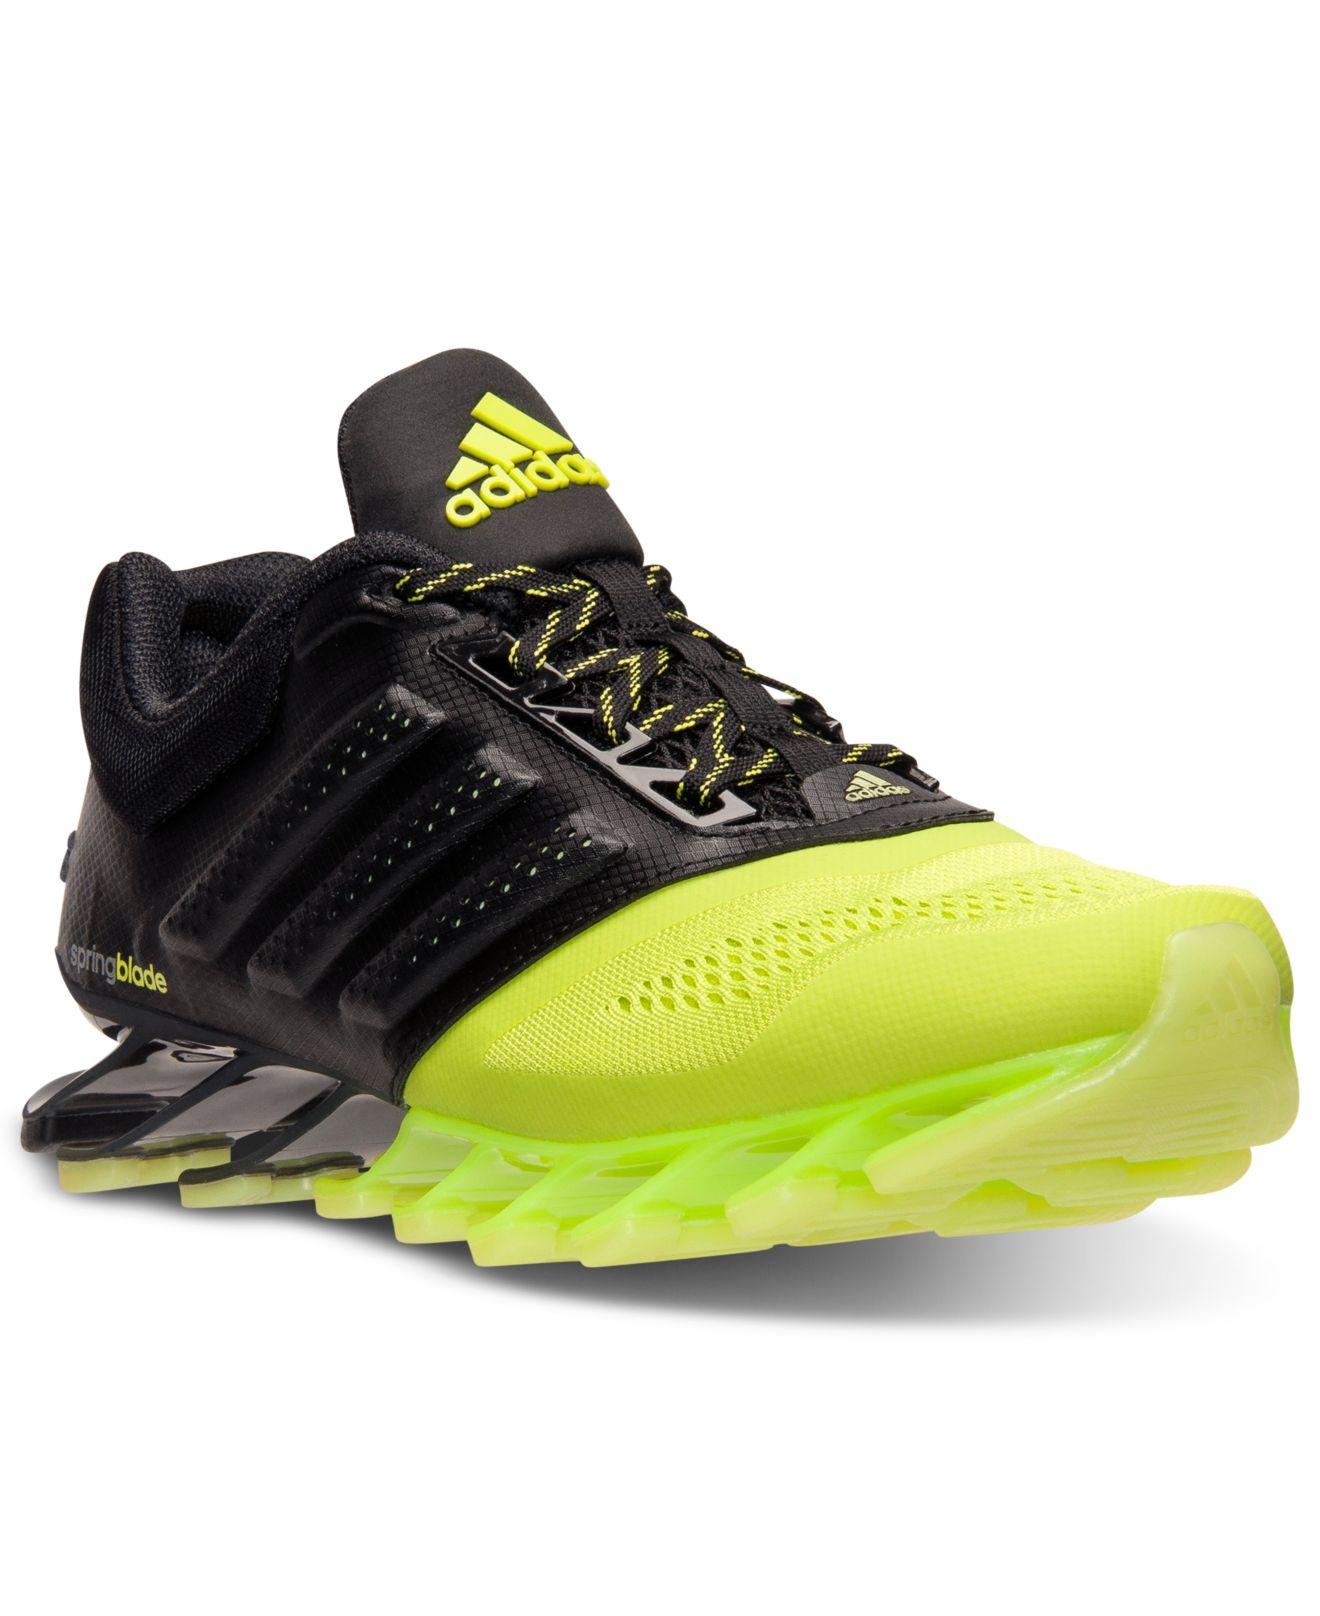 adidas springblade drive 2.0 coral; green 6713 adidas springblade drive 2.0  black yellow adidas springblade drive 2.0 purple yellow